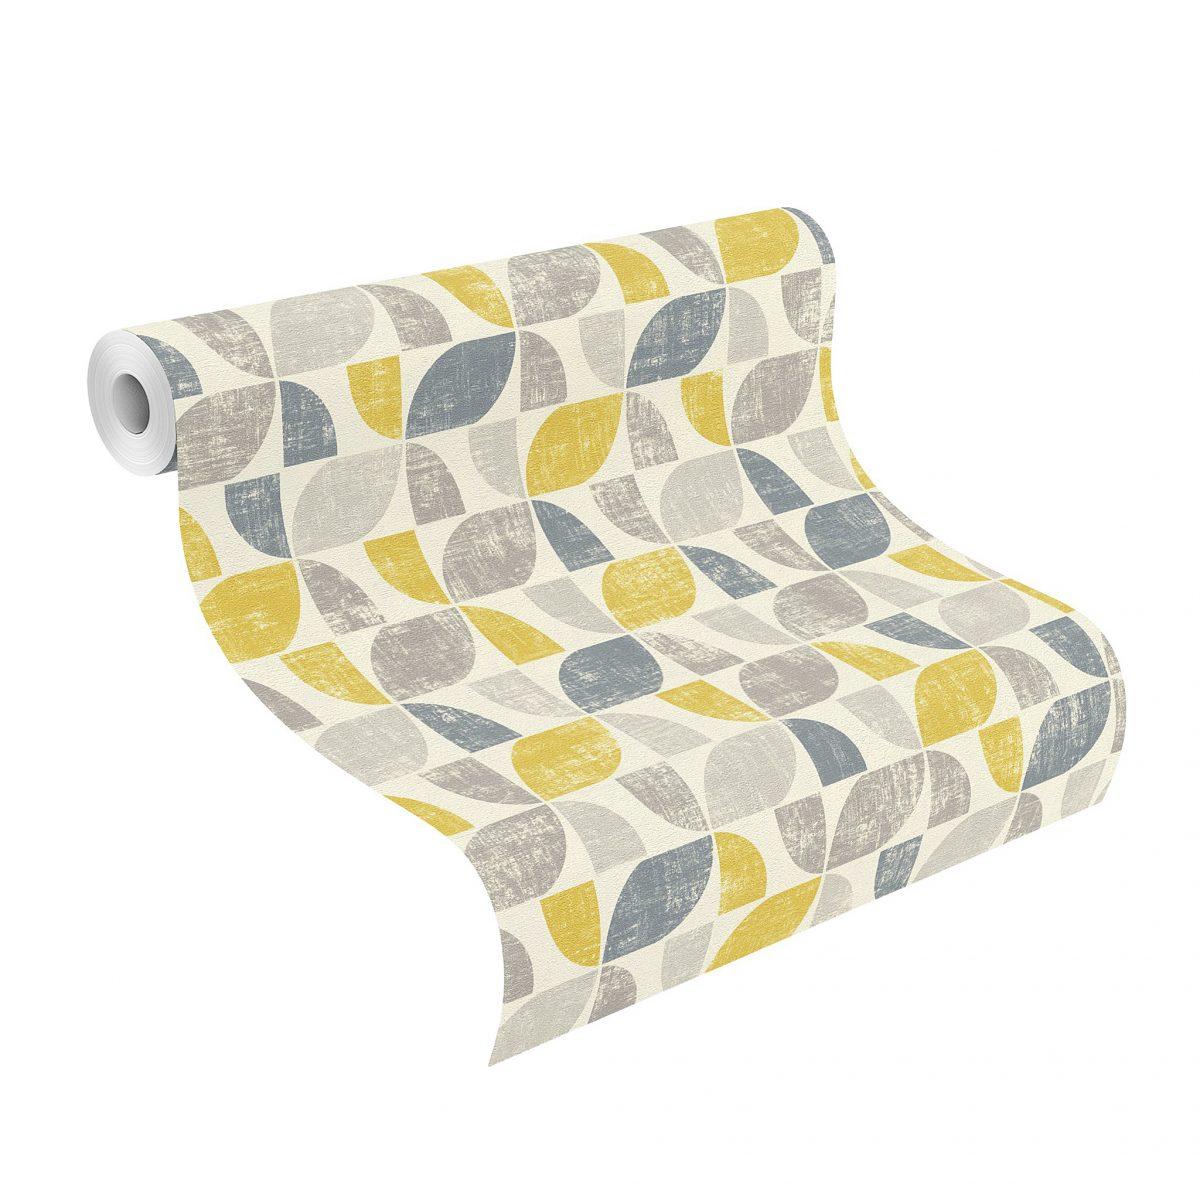 Papel mural diseño multicolor gris amarillo HYDE PARK 519846 RASCH